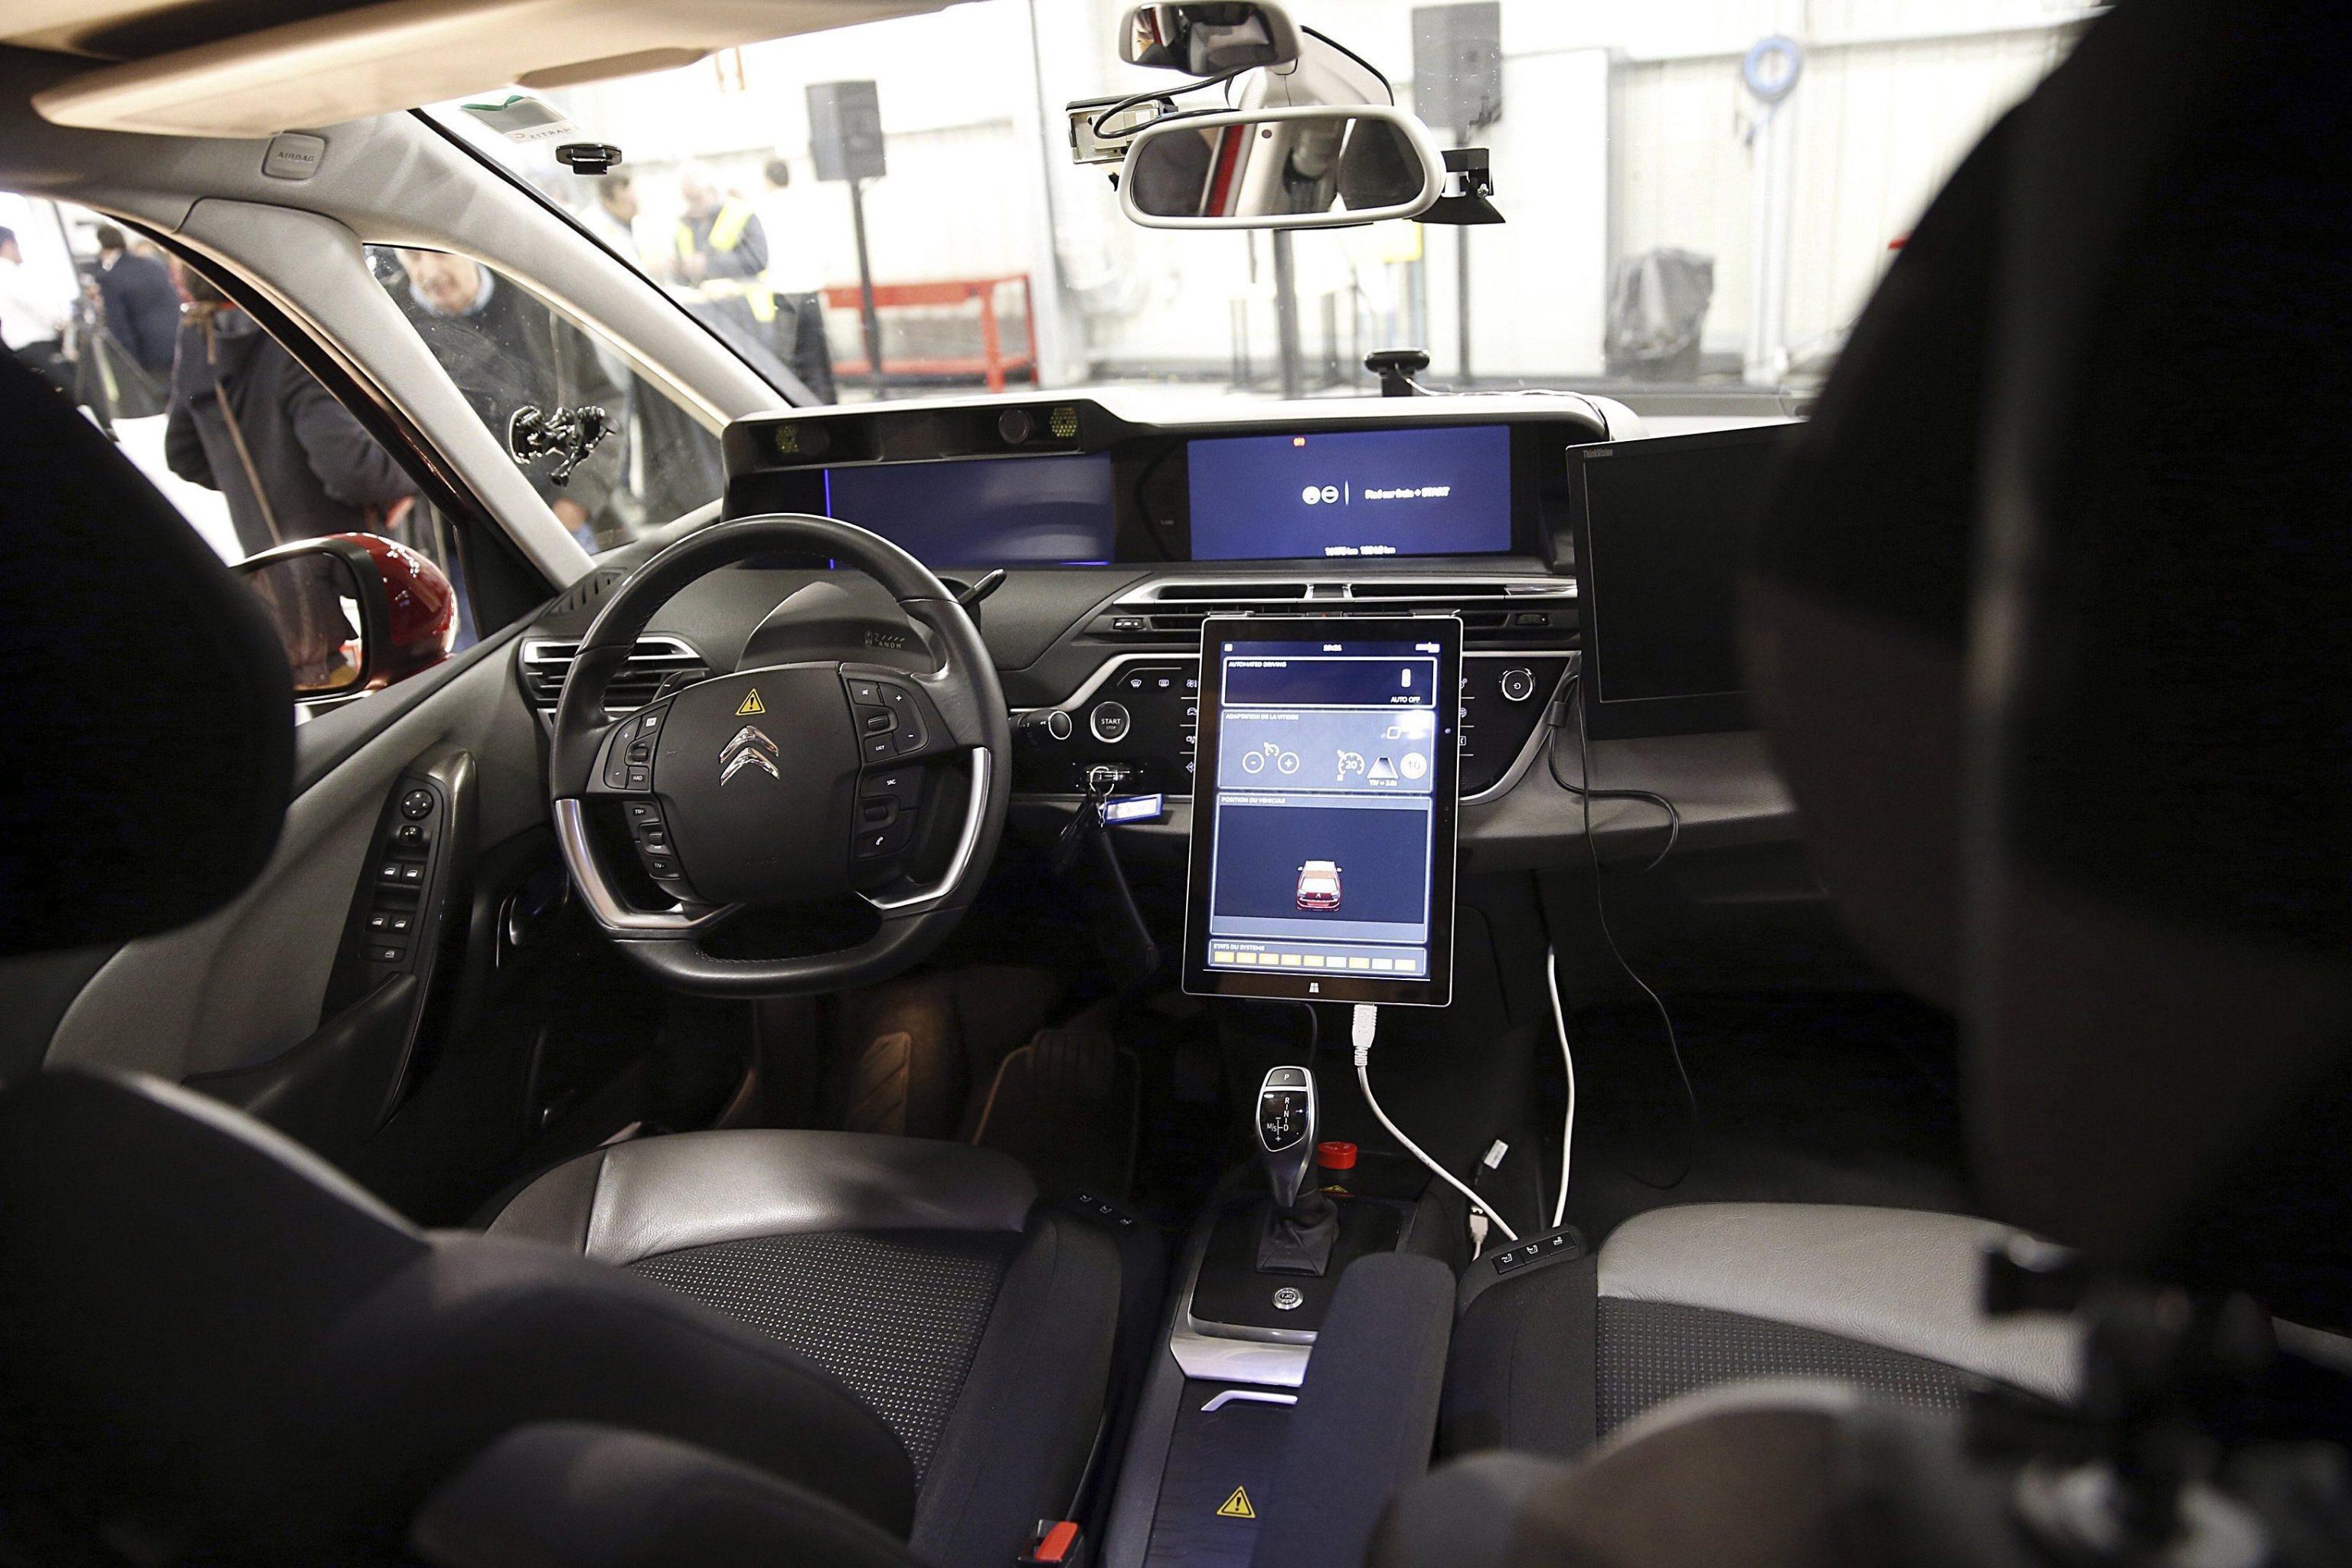 Auto autonoma rischia aumentare traffico